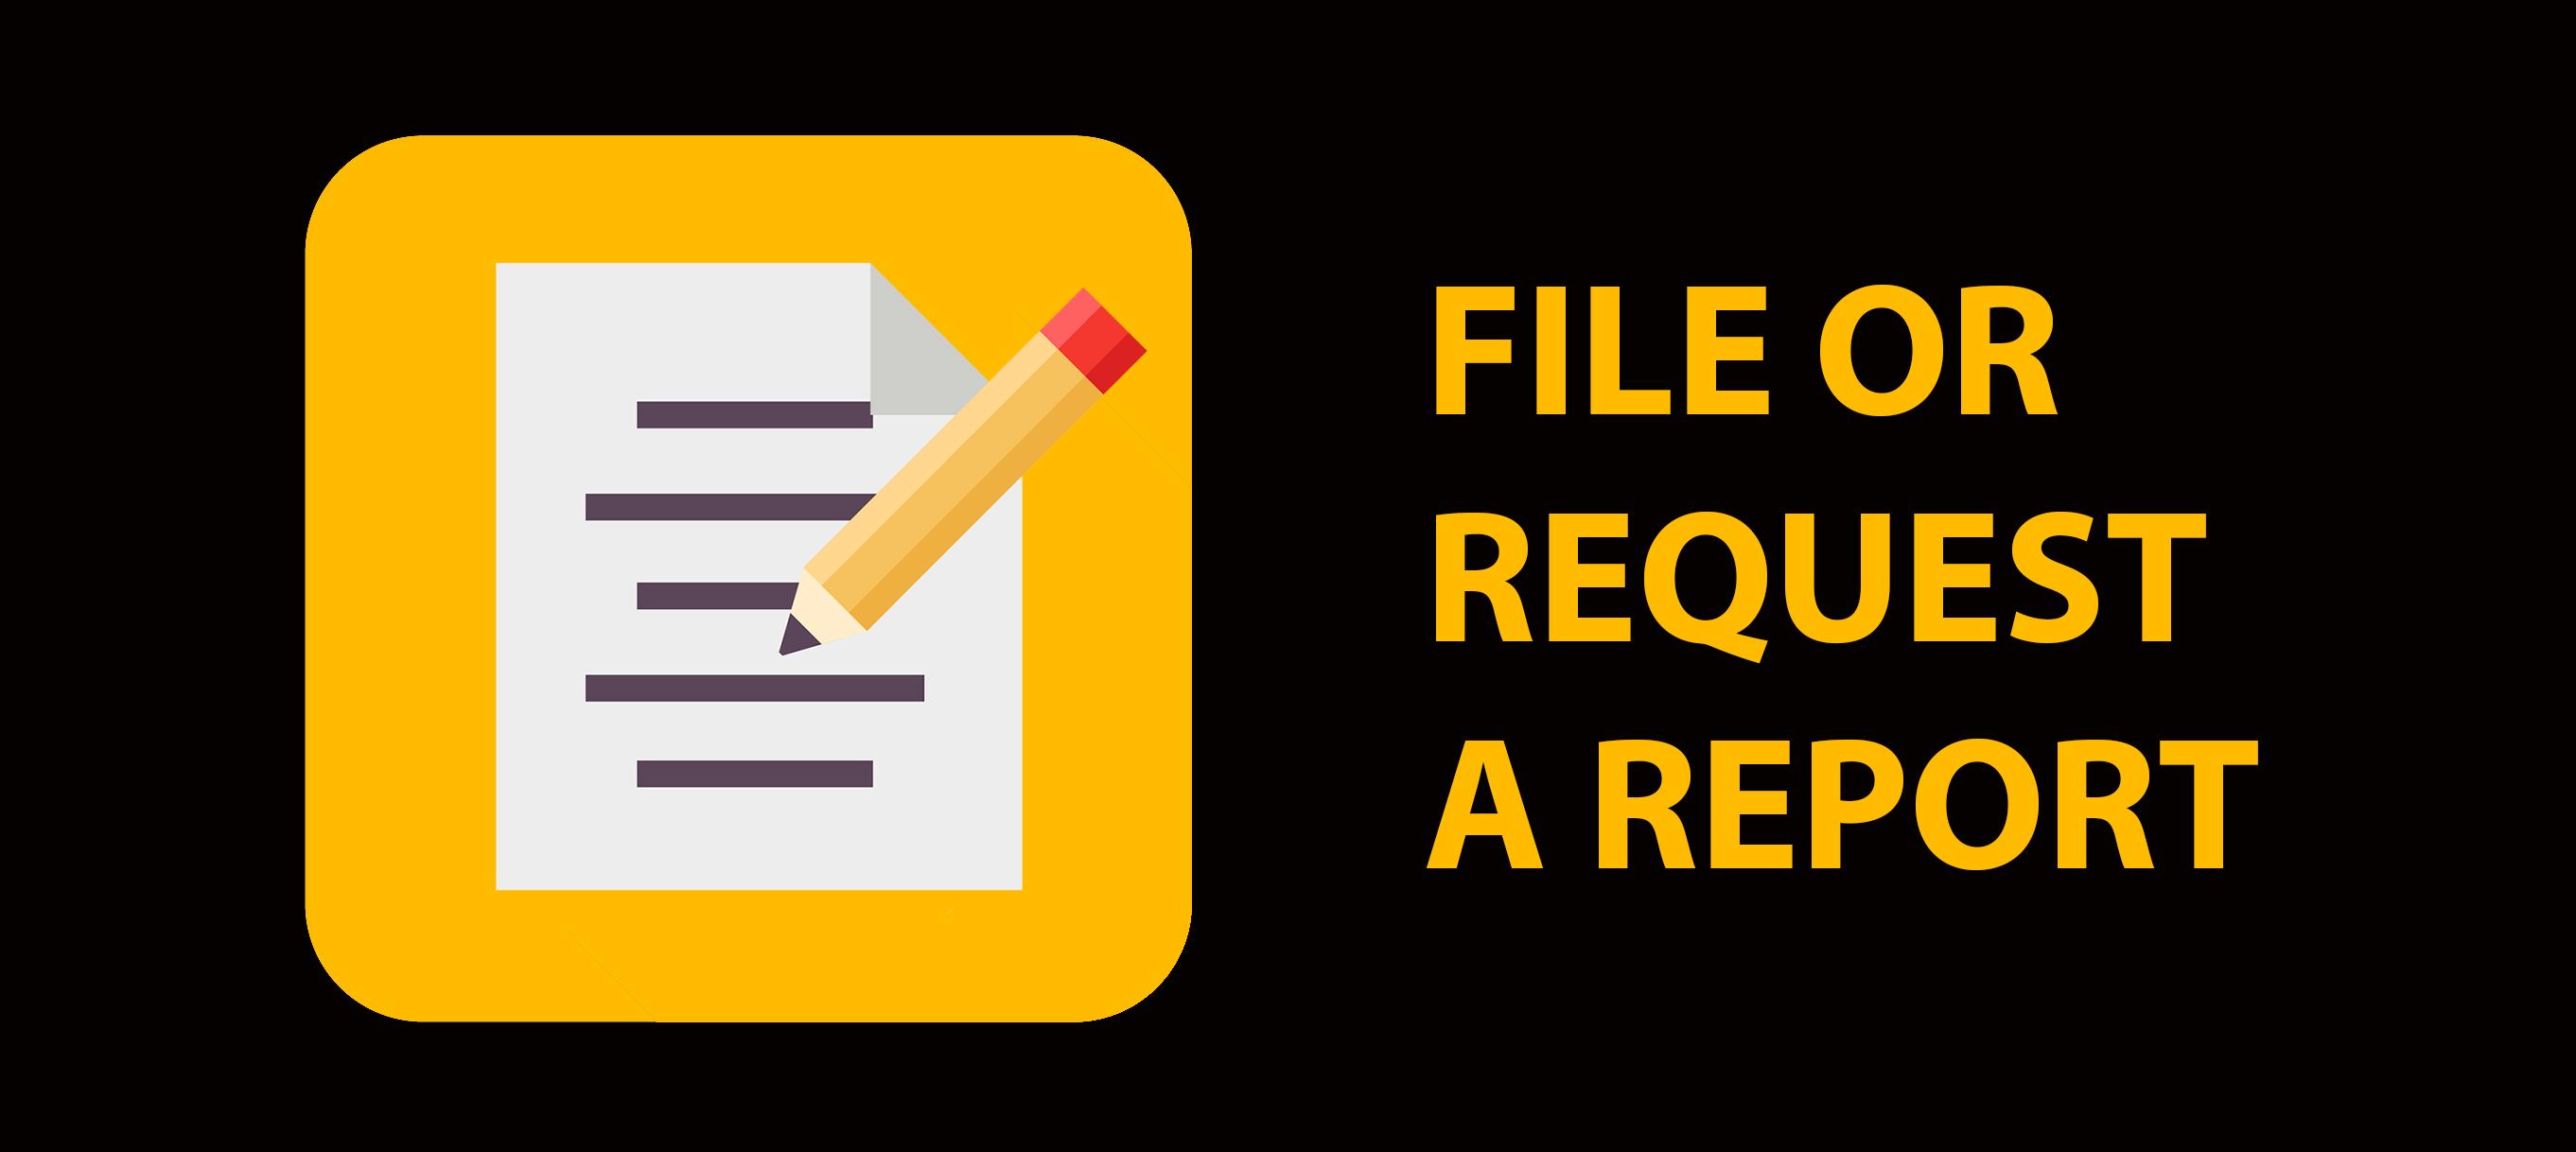 Make or File a Report